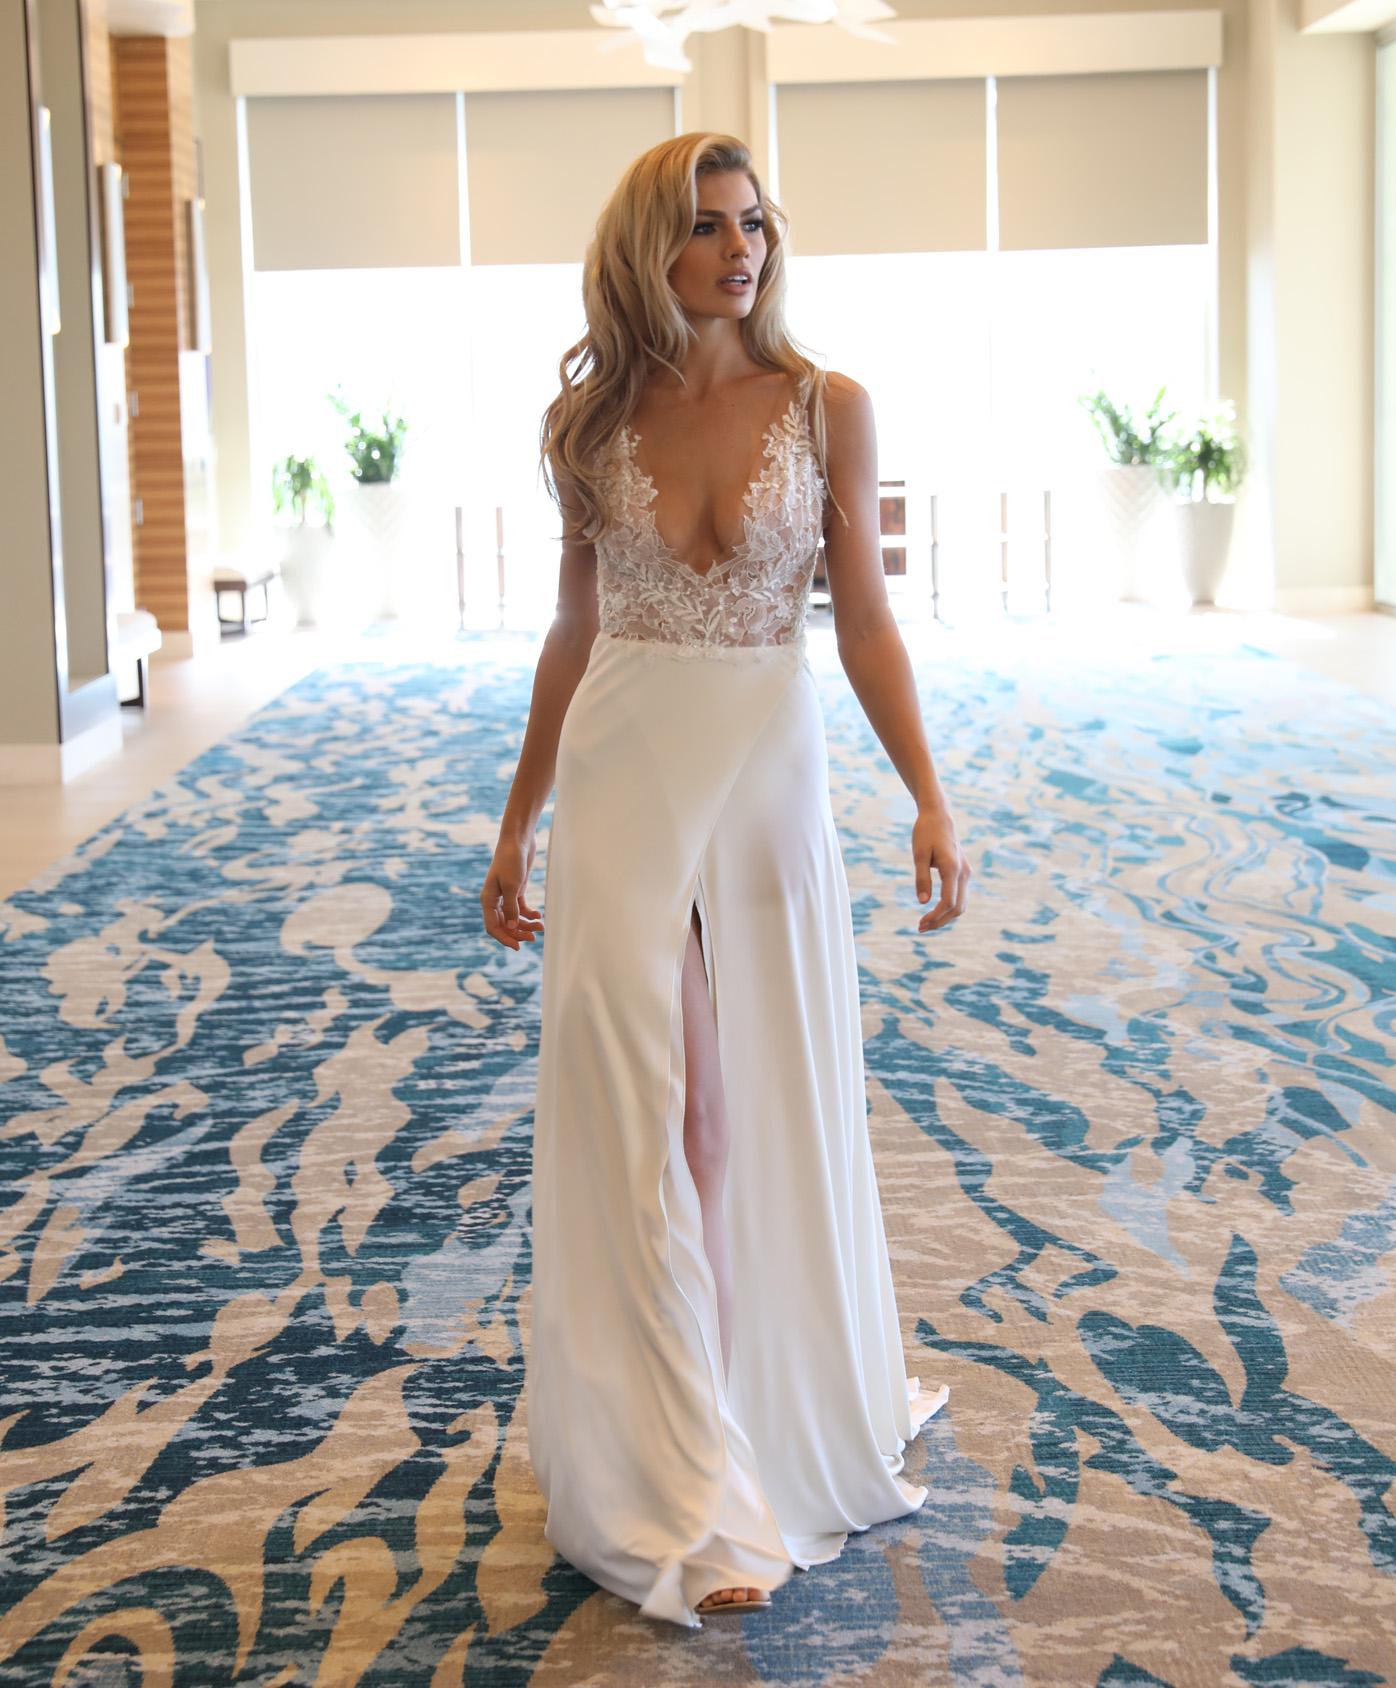 Erin Cole - Asia1 - Brautsalat